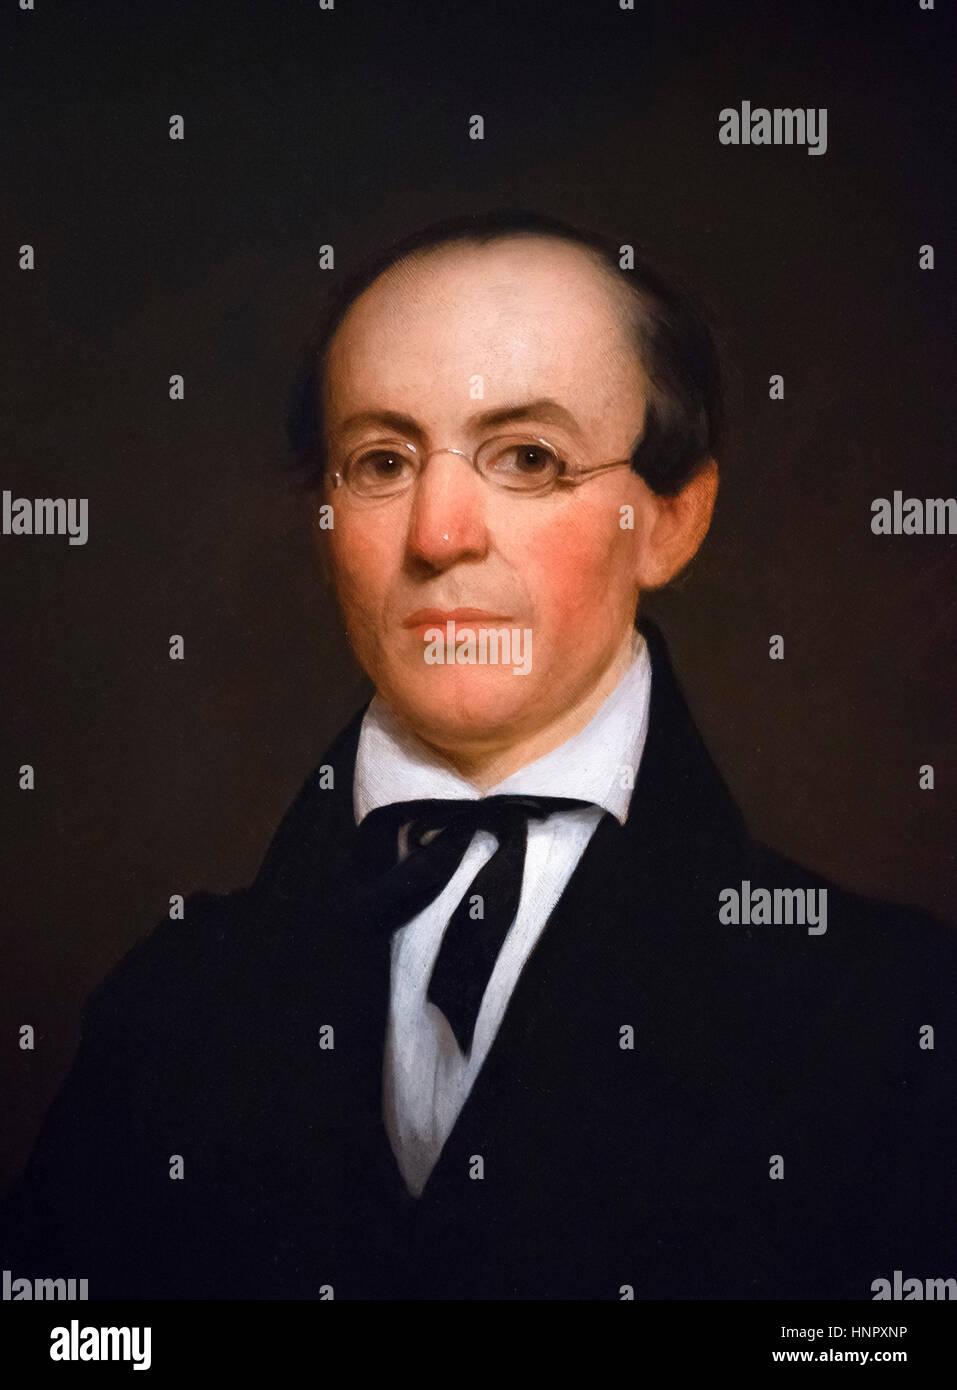 William Lloyd Garrison (1805-1879), portrait by Nathaniel Jocelyn, oil on wood panel, 1833. Garrison was a prominent - Stock Image